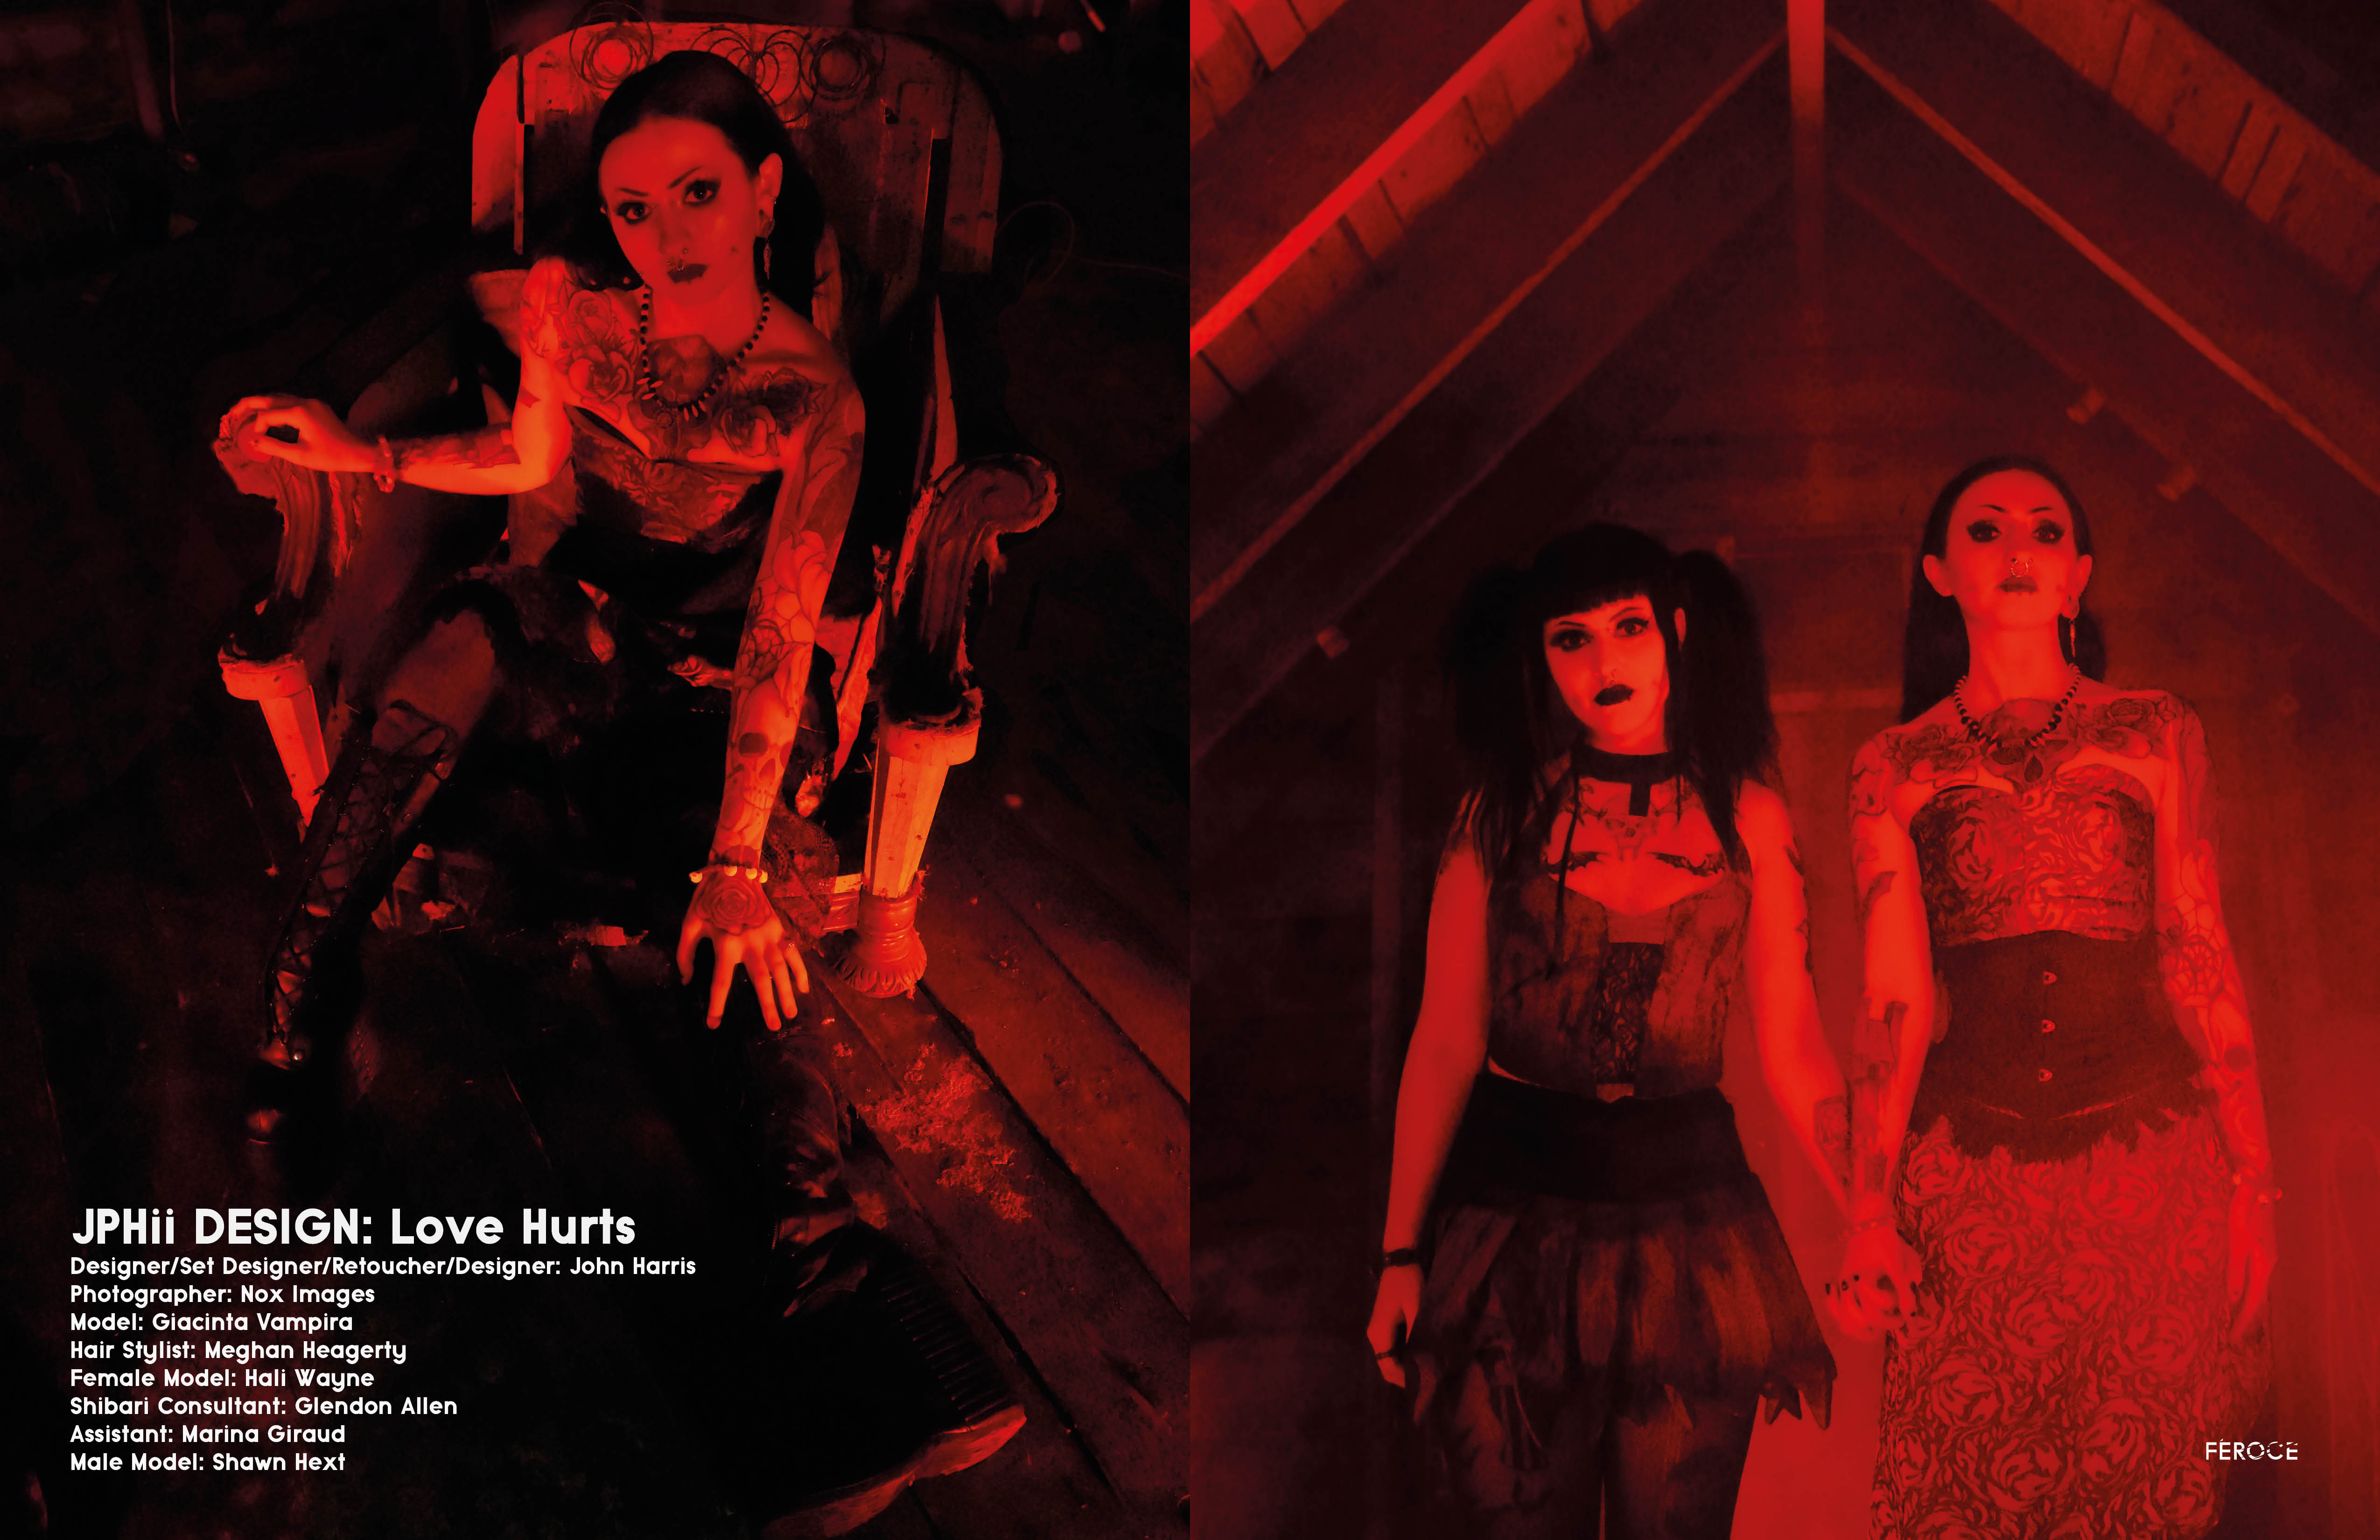 Love Hurts in Feroce Magazine